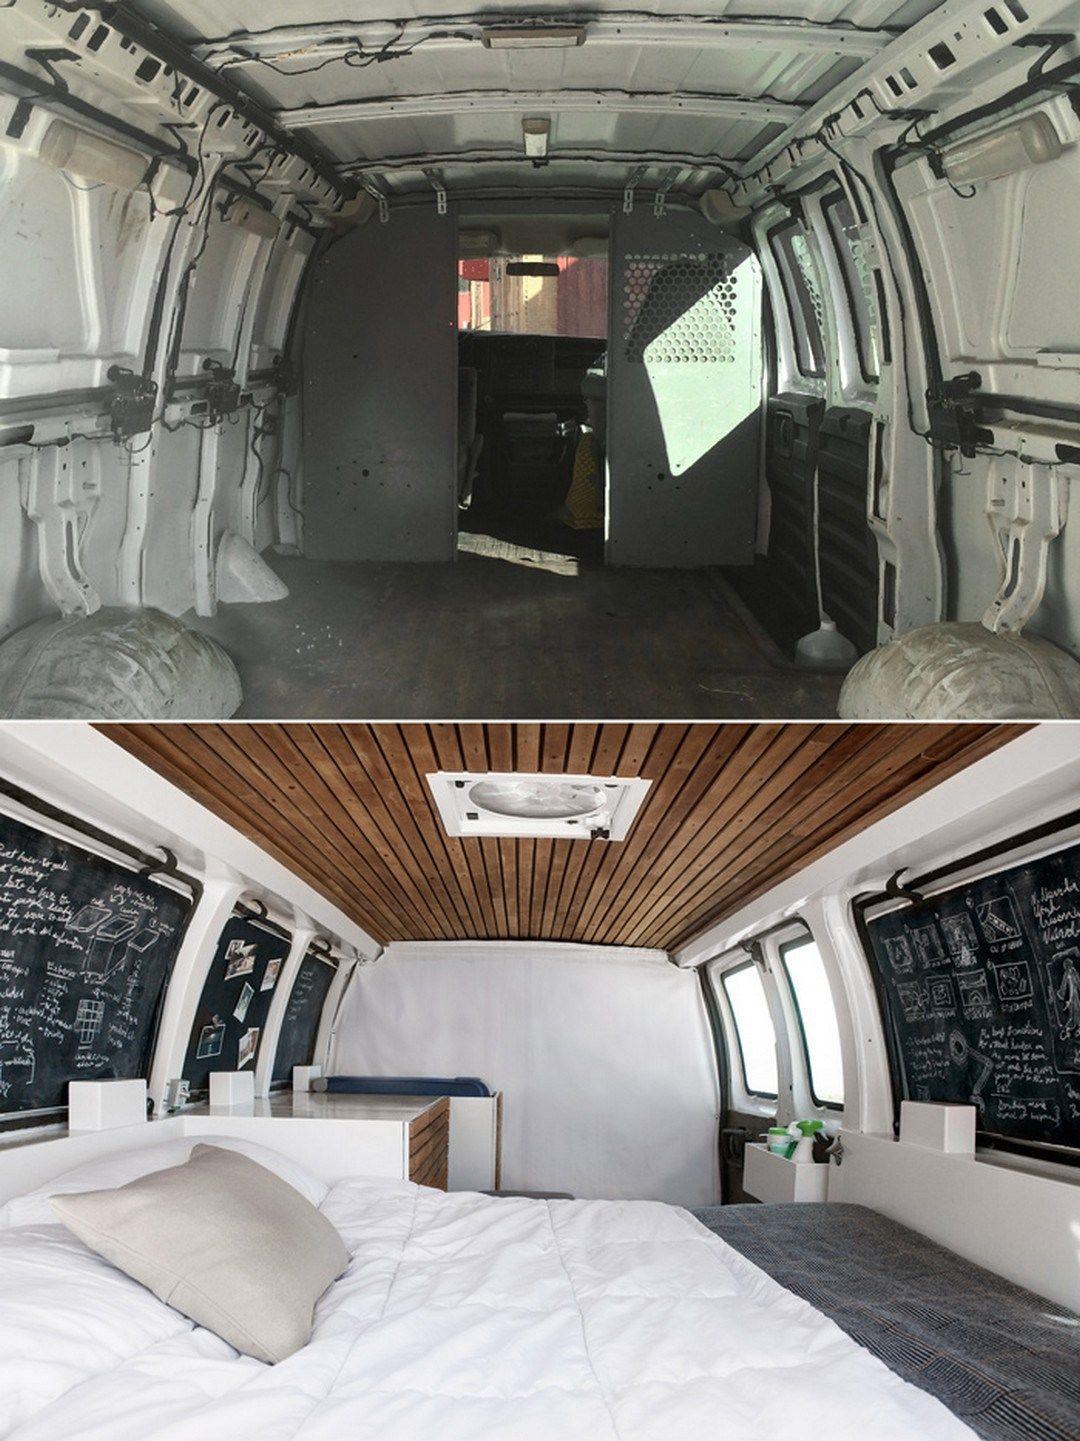 50 cool and fresh ideas van life interior design 4